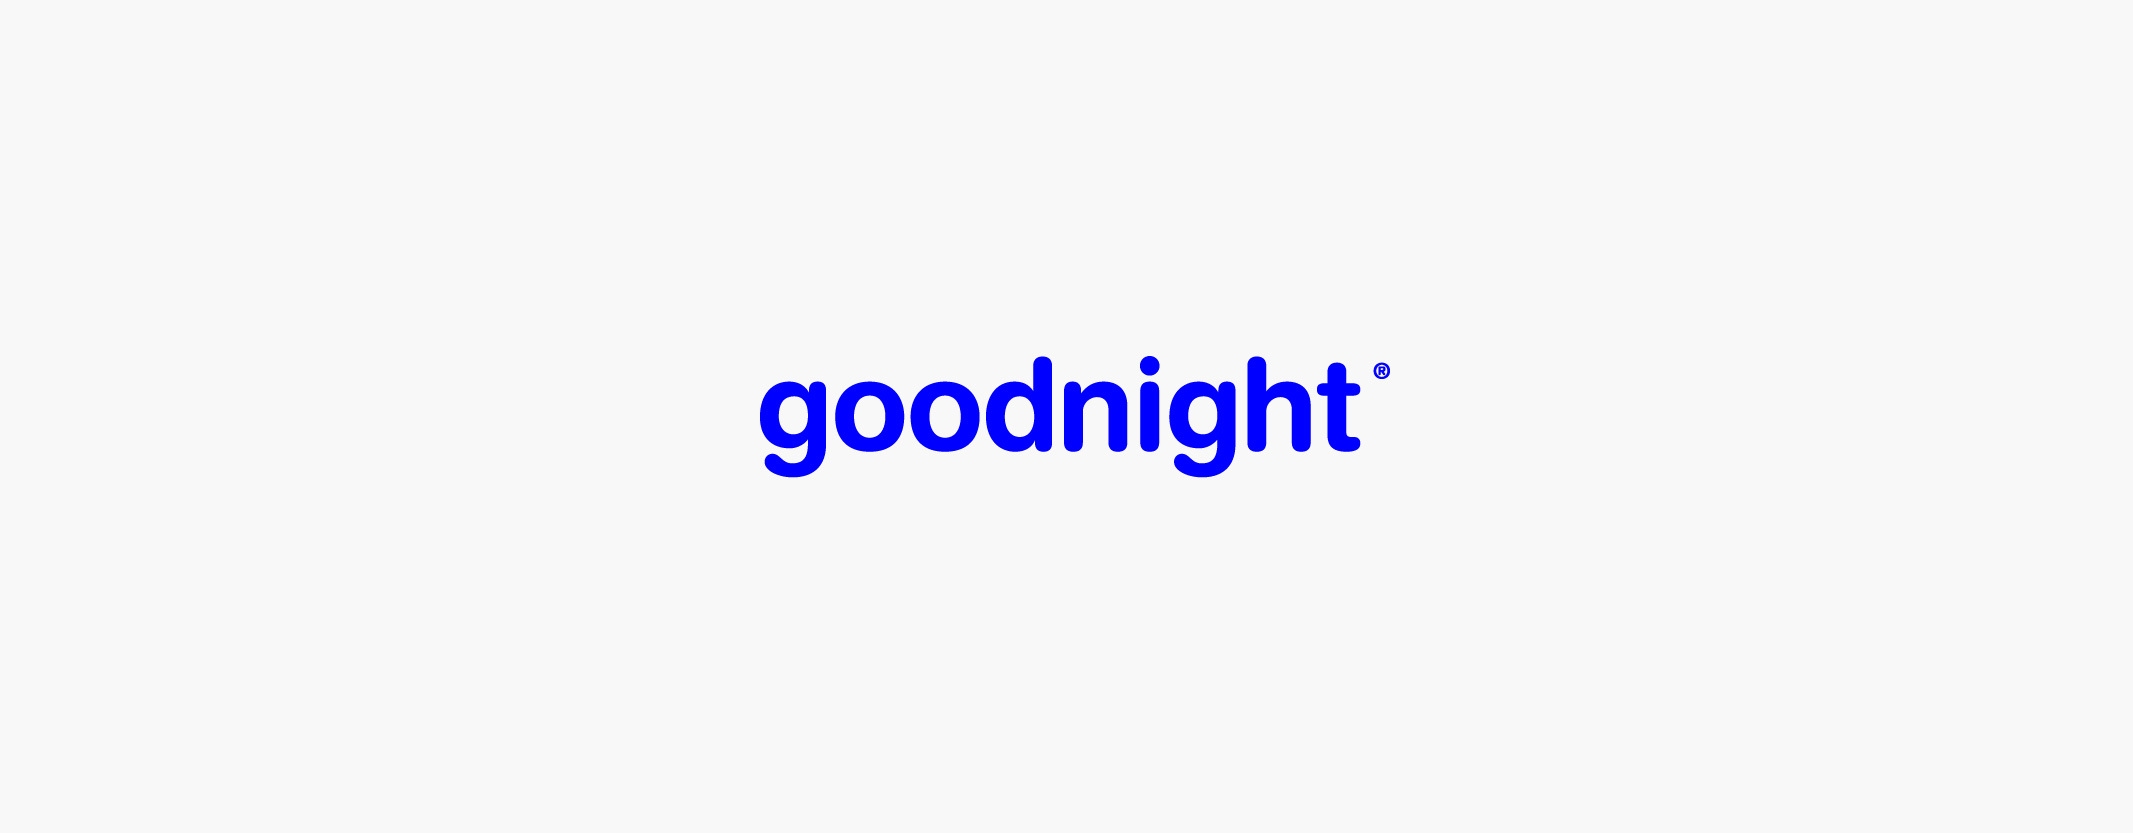 41_logos_goodnight